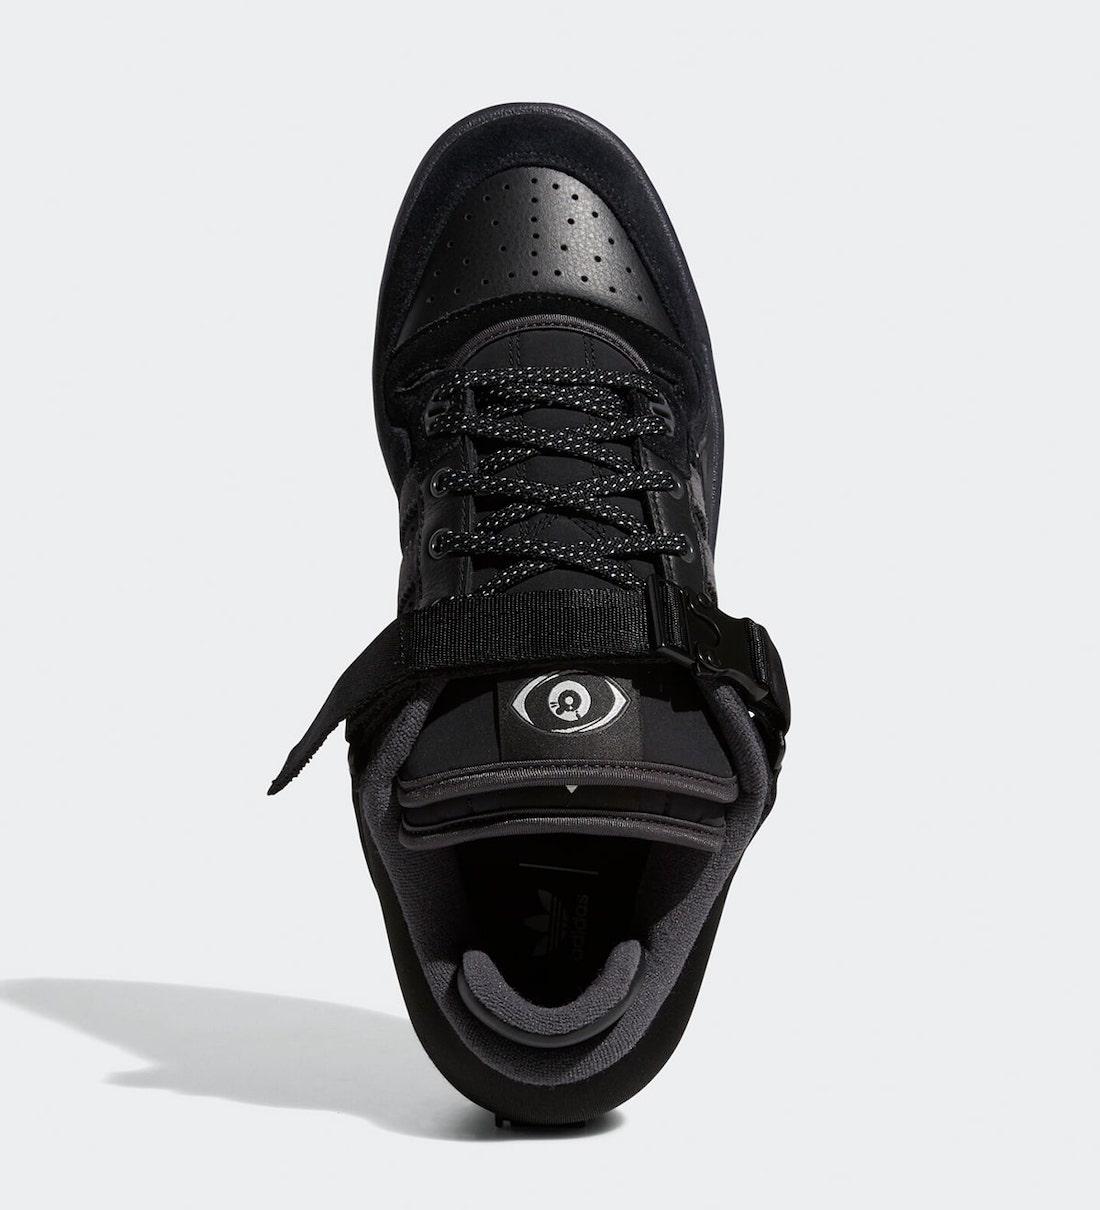 Bad-Bunny-adidas-Forum-Buckle-Low-Black-GW5021-Release-Date-3